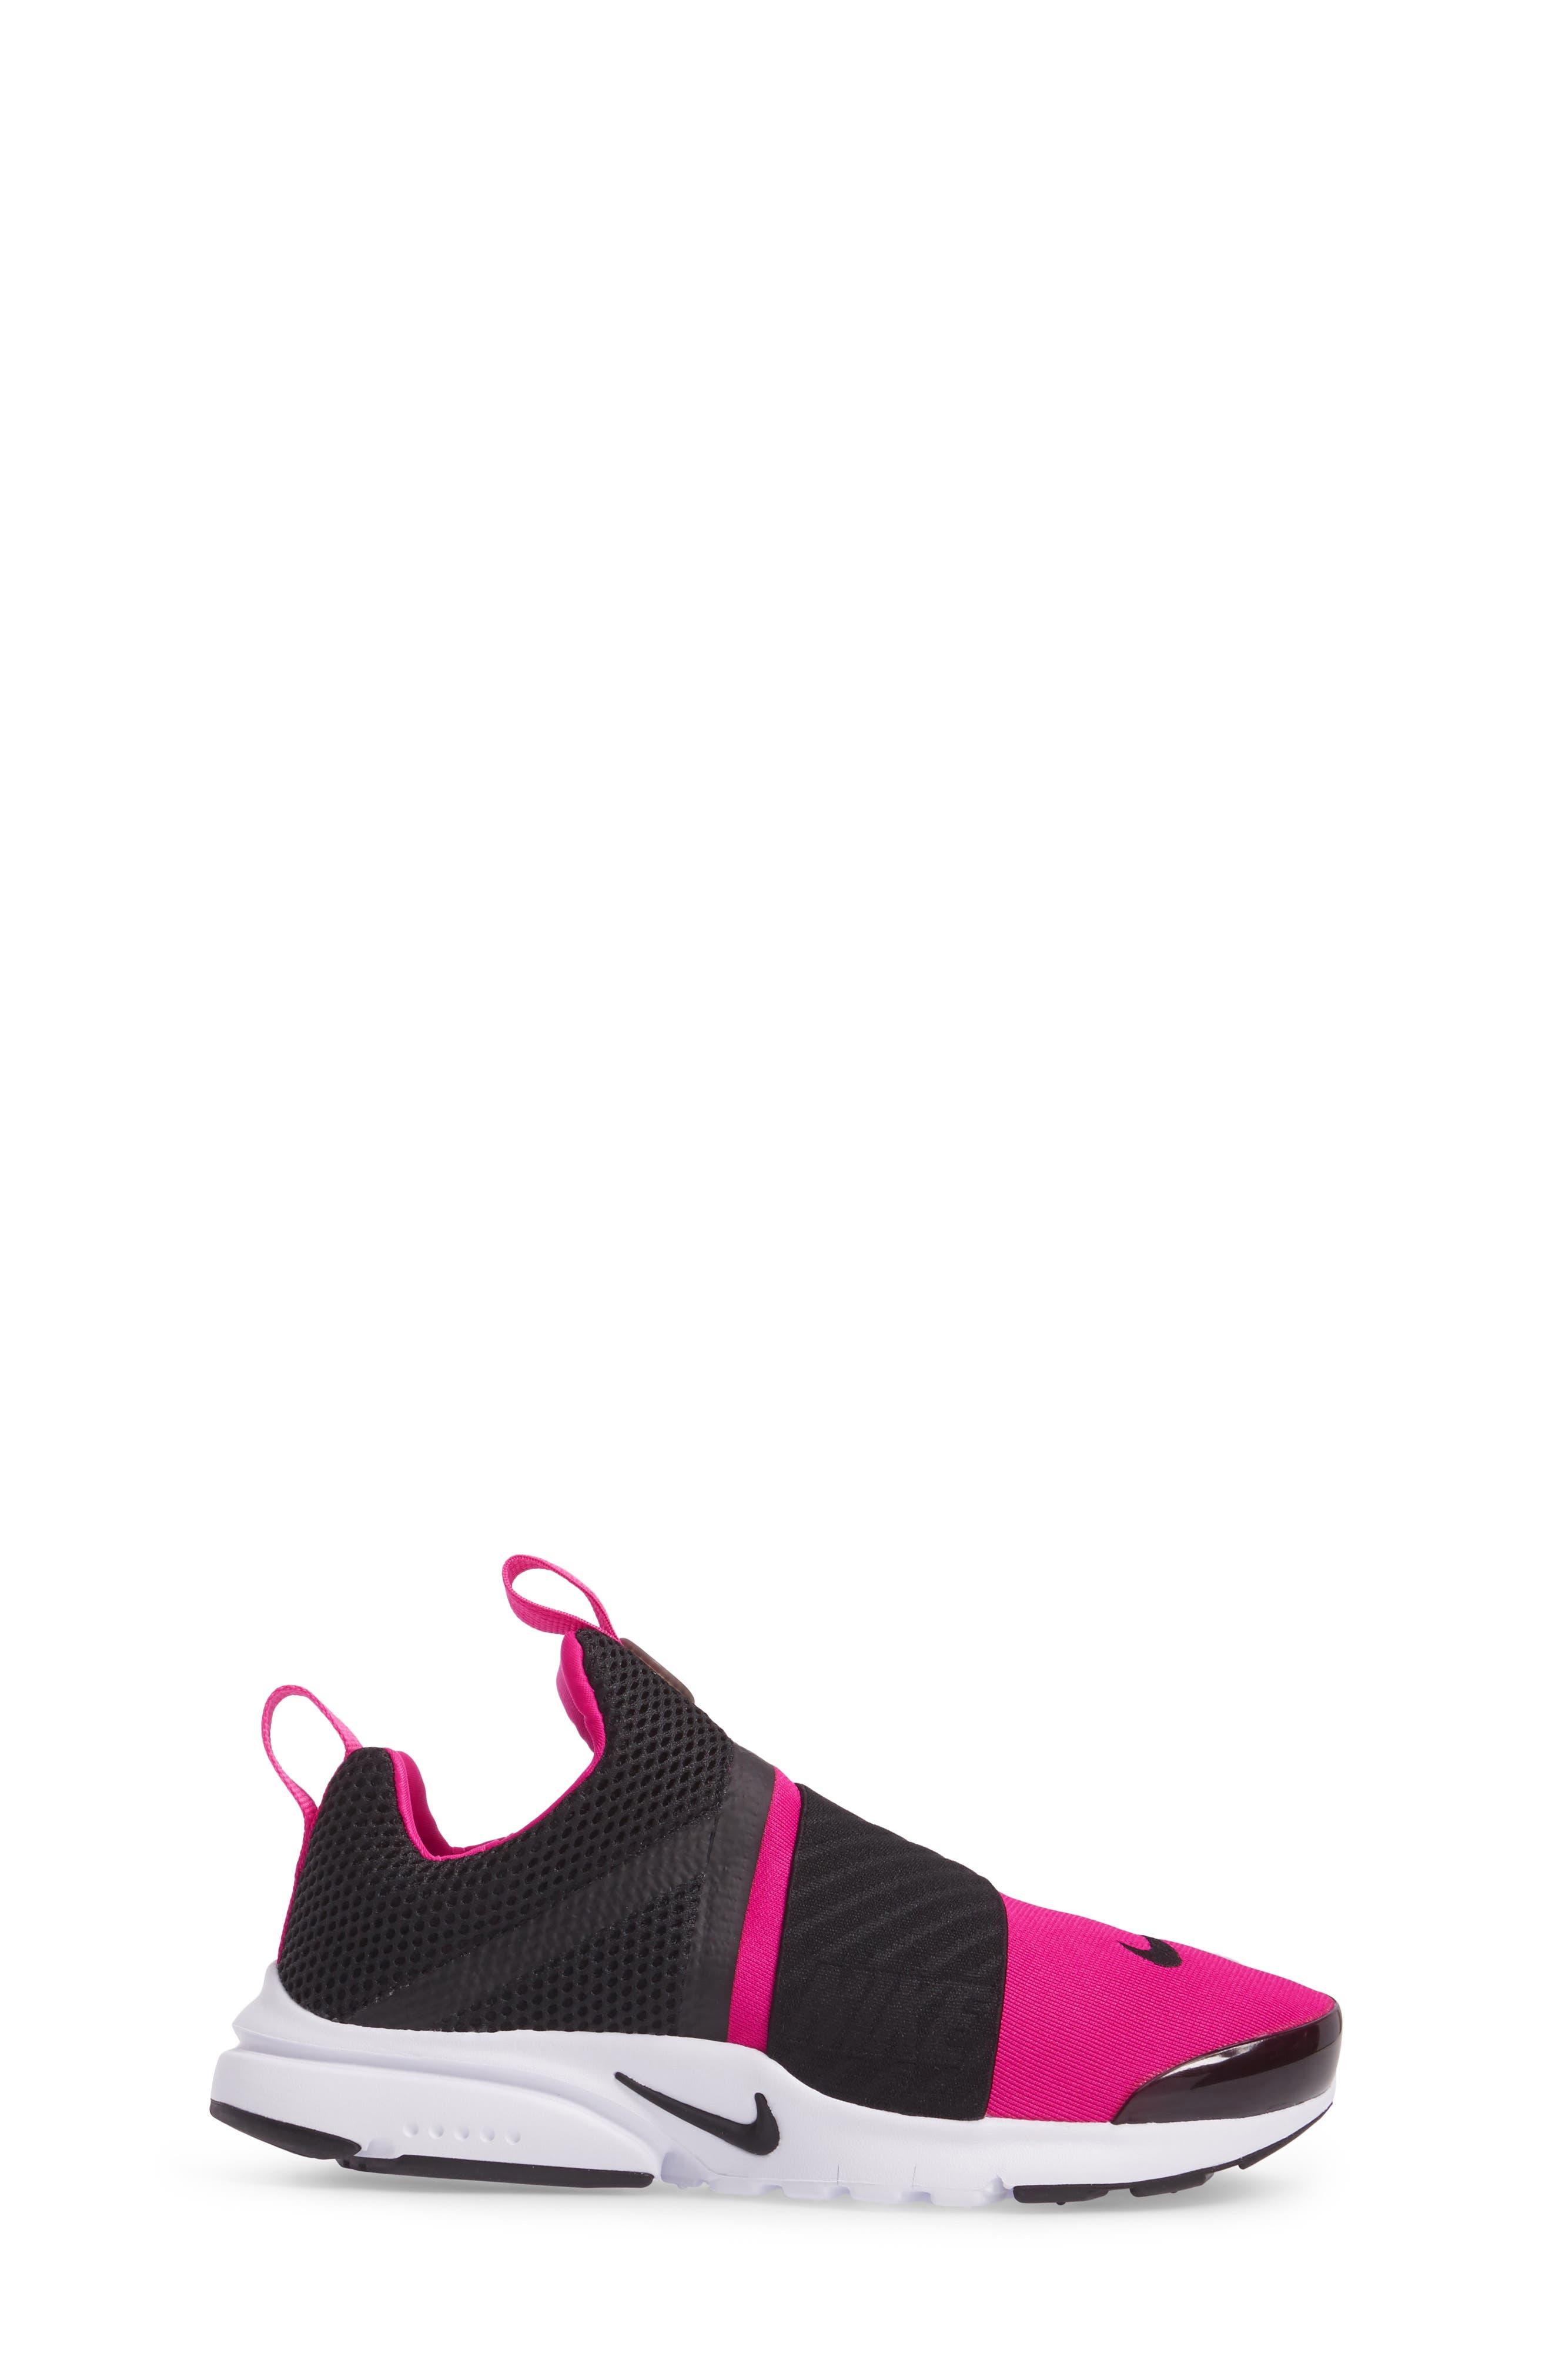 Presto Extreme Sneaker,                             Alternate thumbnail 12, color,